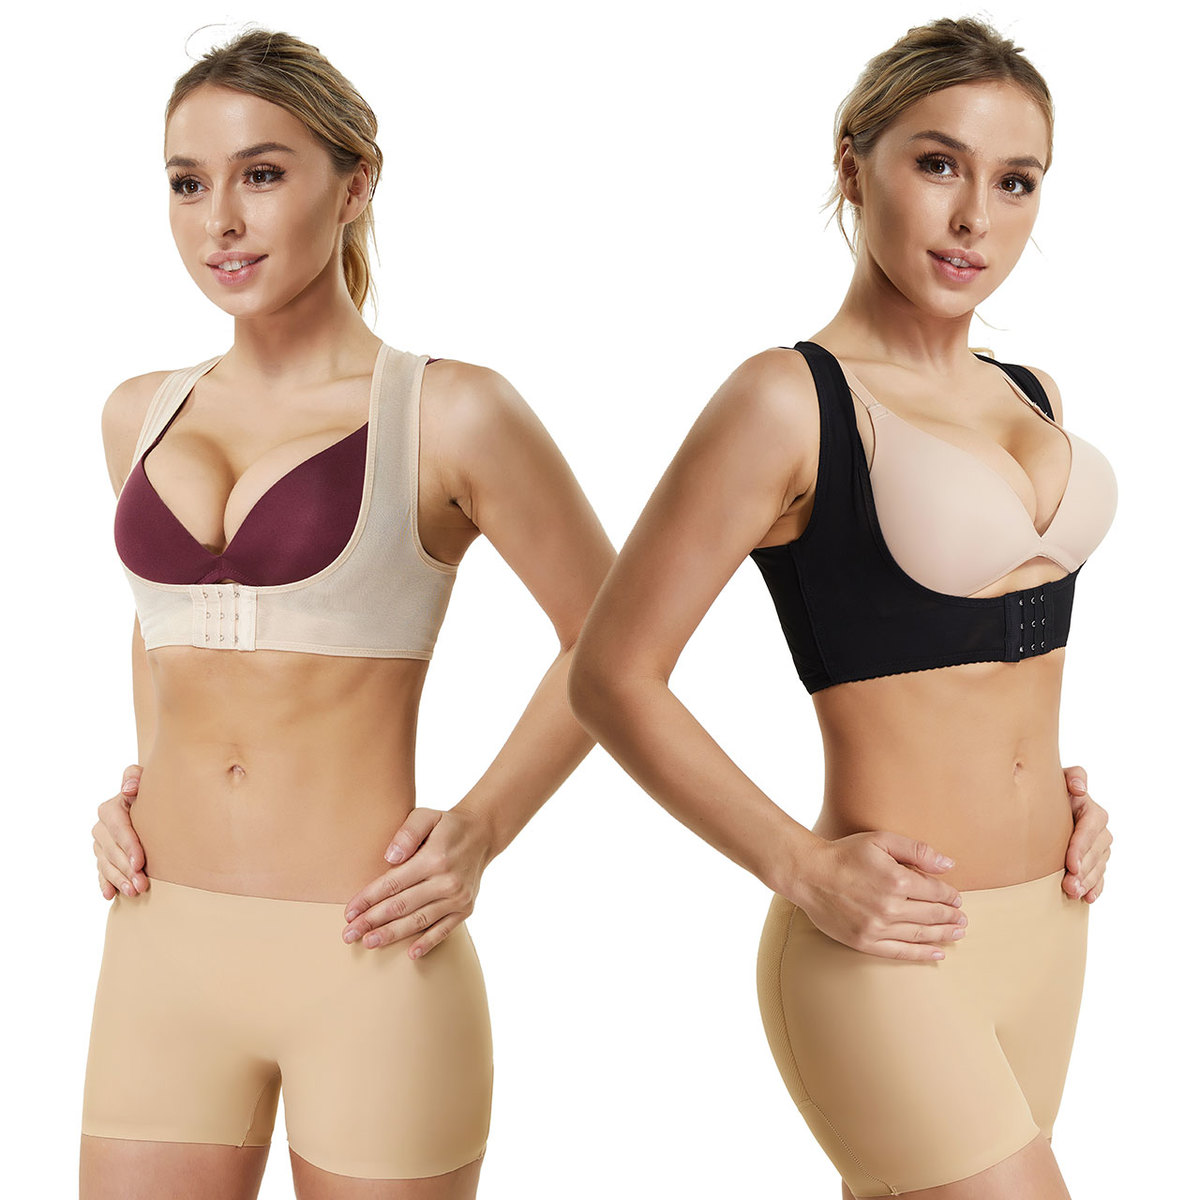 Joyshaper Chest Brace Up for Women Posture Corrector Shapewear Tops Breast Support Bra Top X Strap Bras Black, Large